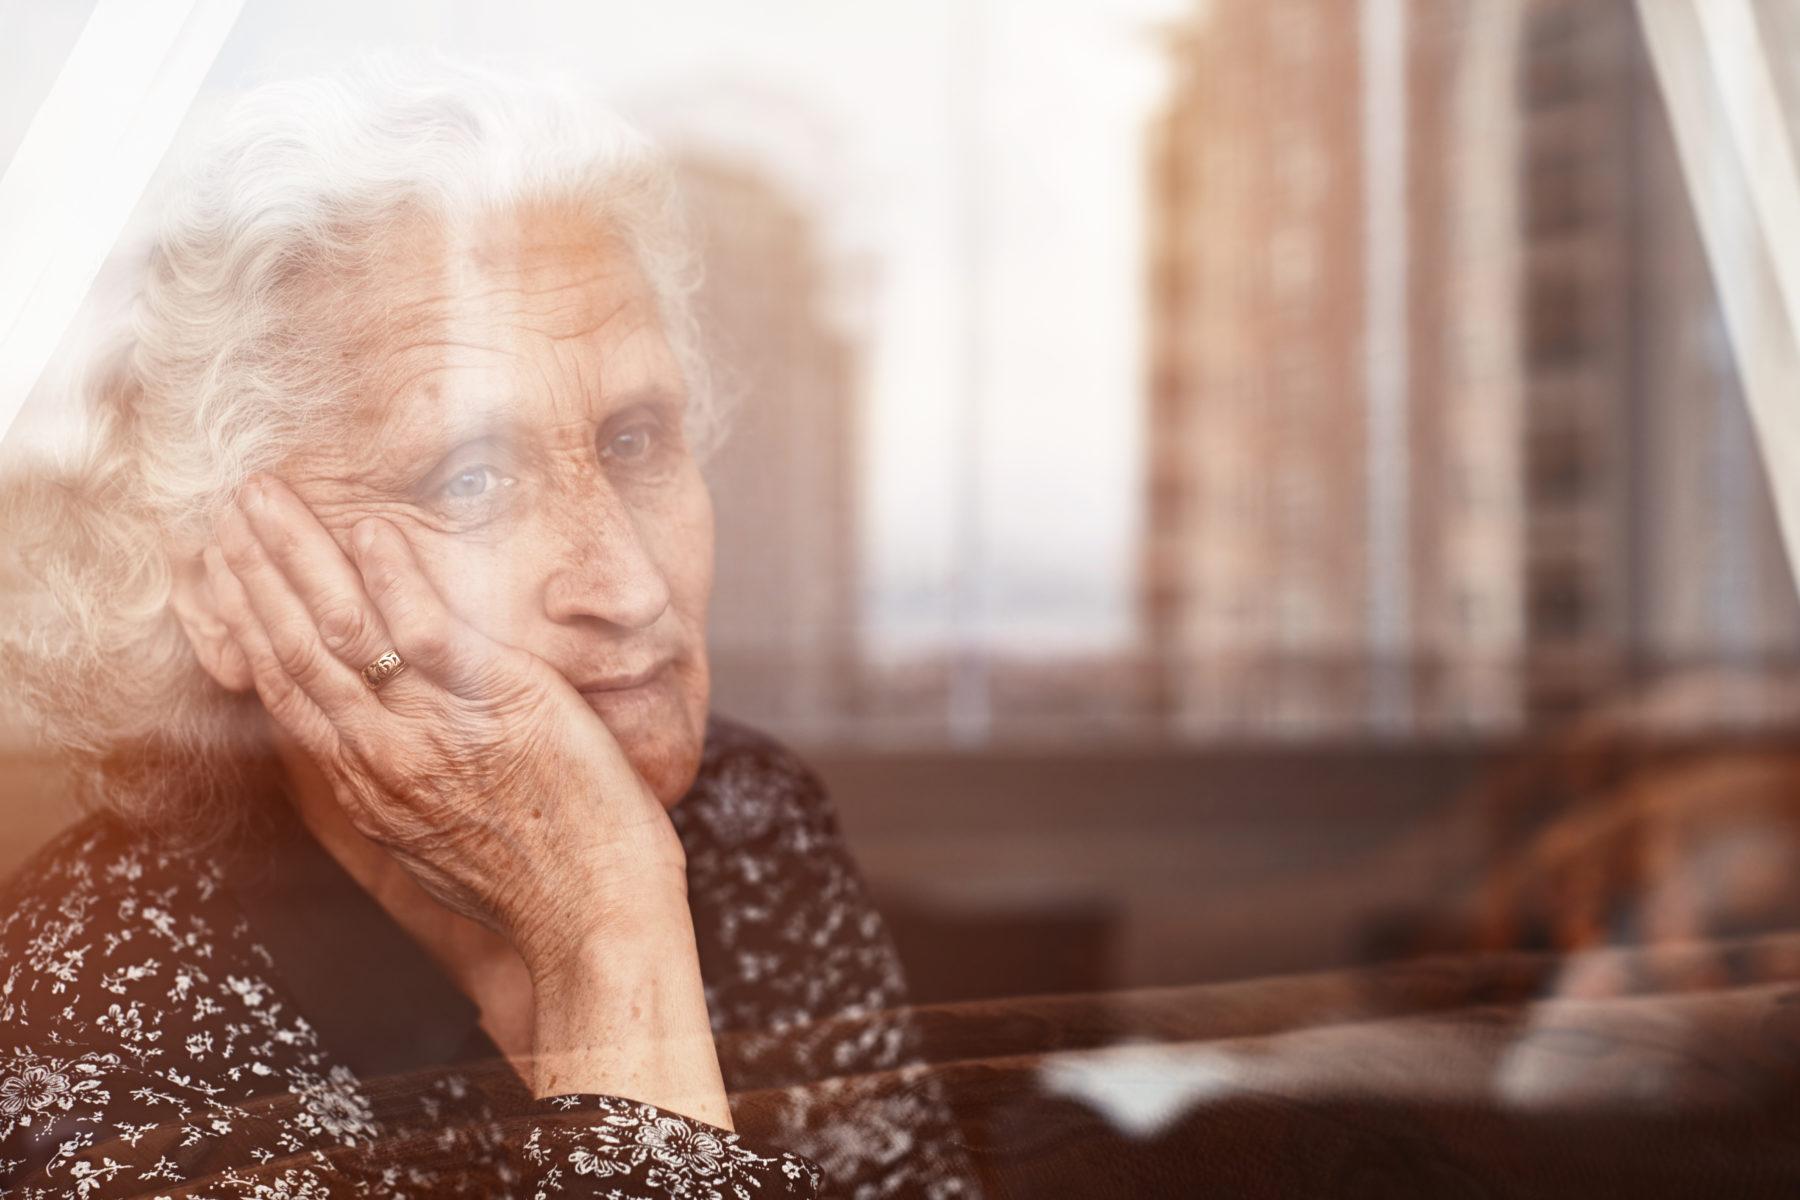 senior woman suffering from nursing home abuse in Nashville, TN